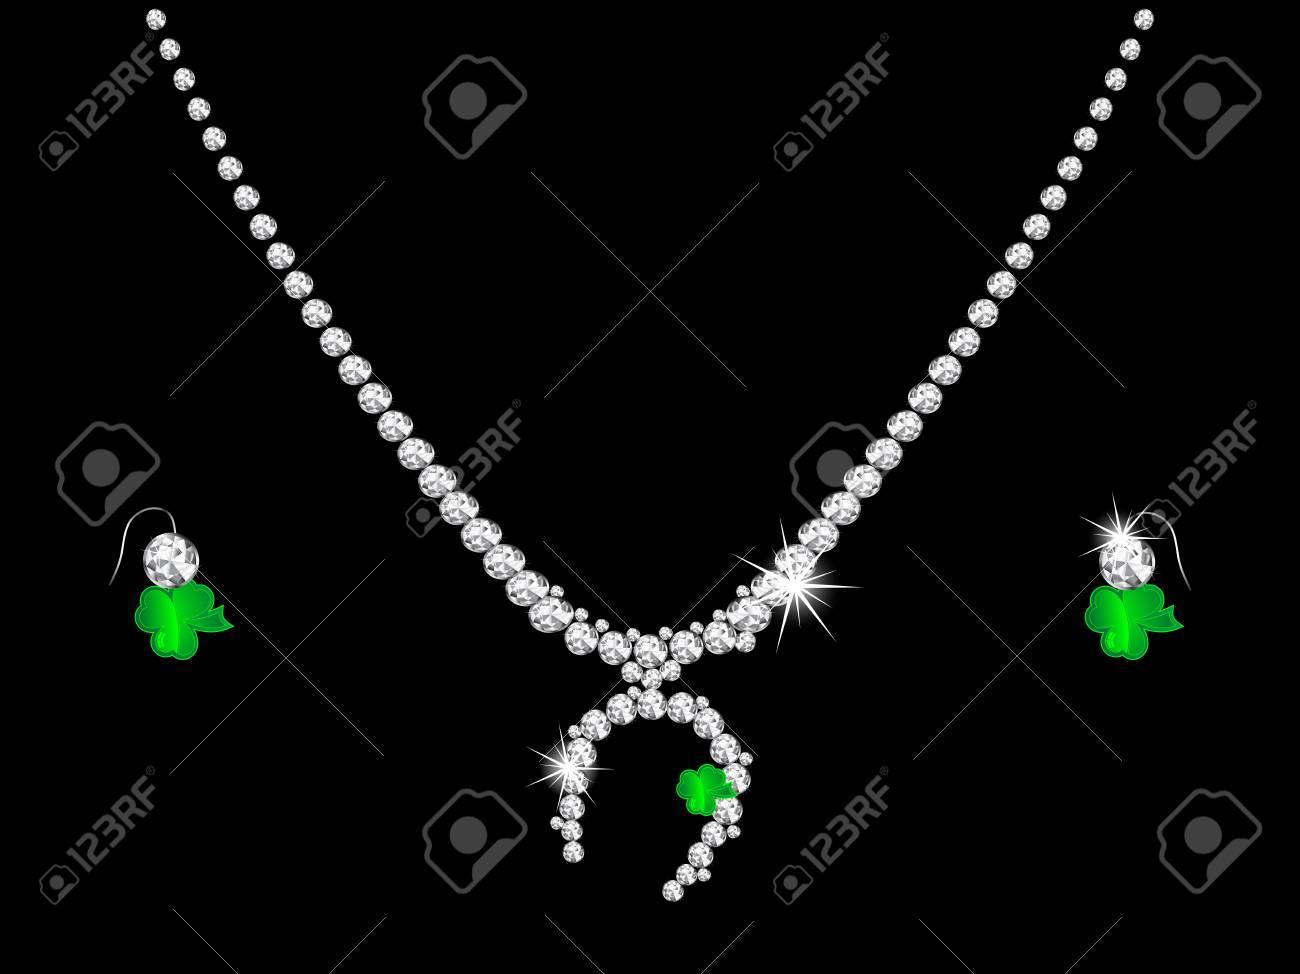 Luxury diamond necklace on black background Stock Vector - 17019128